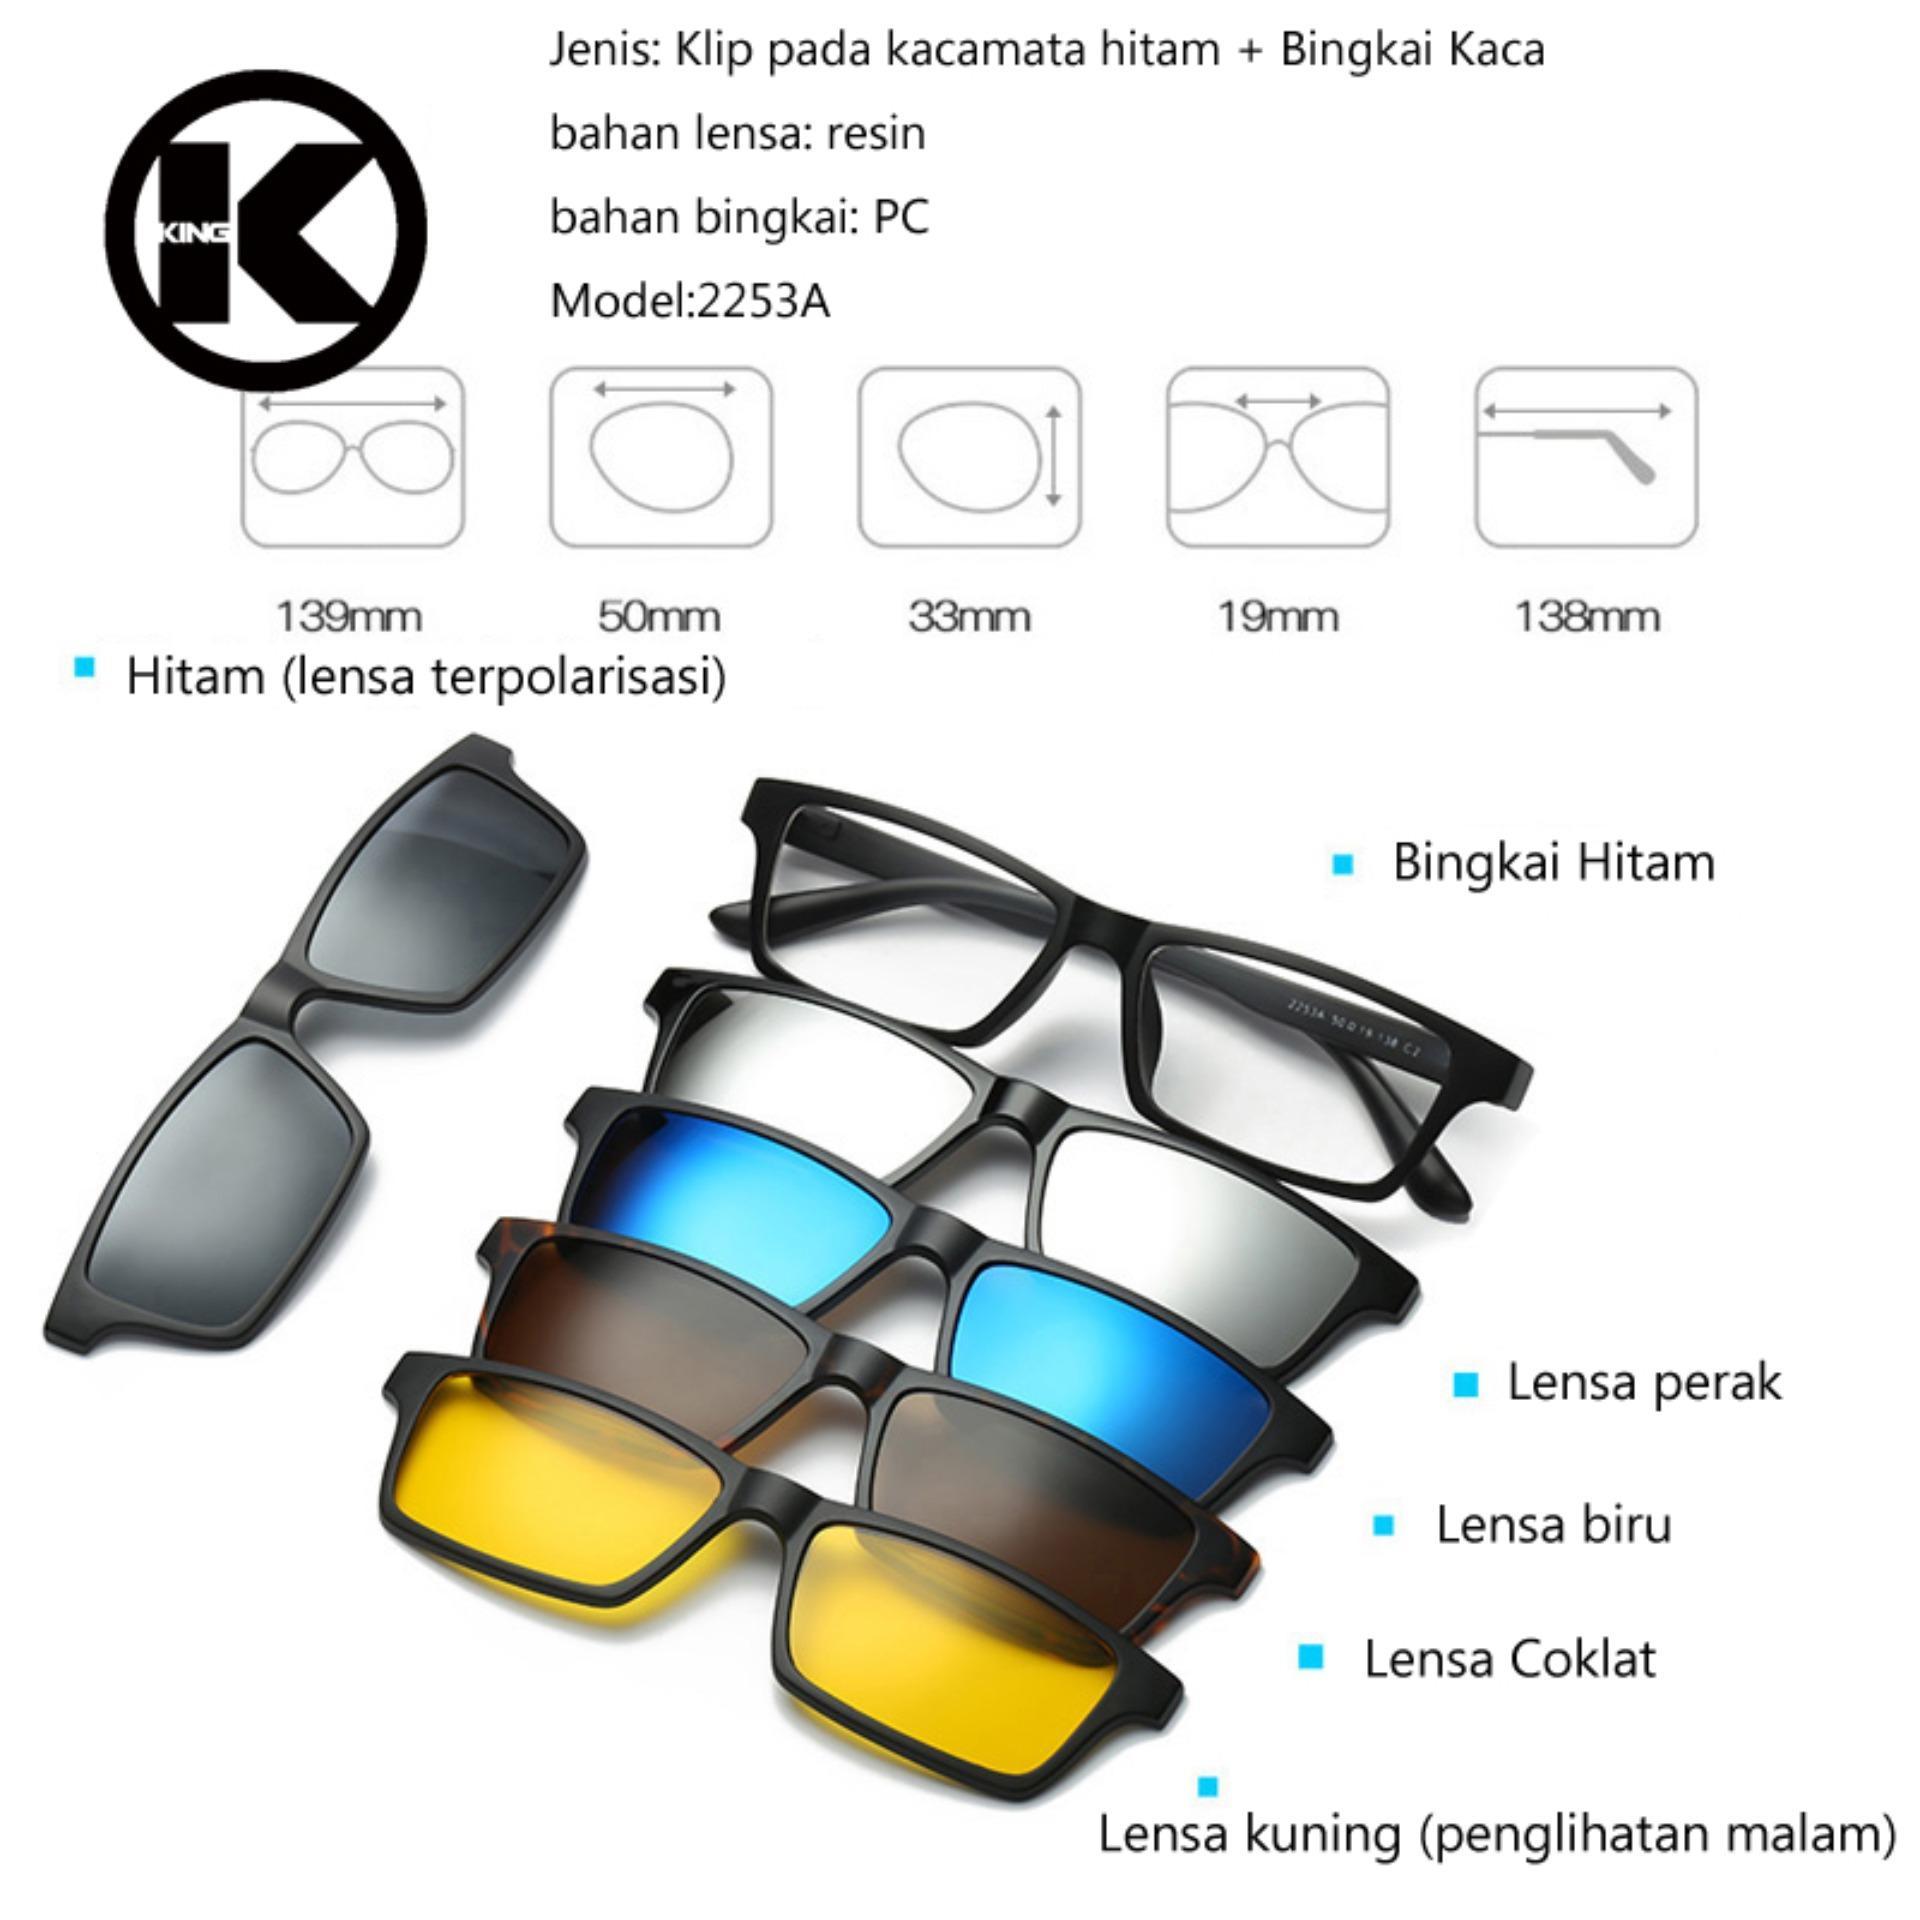 5 + 1 Gugatan Mode Klip Pada Kacamata Wanita Frame Klip Kacamata Magnetik  Magnet Kacamata Pria 3c4d24ddcc